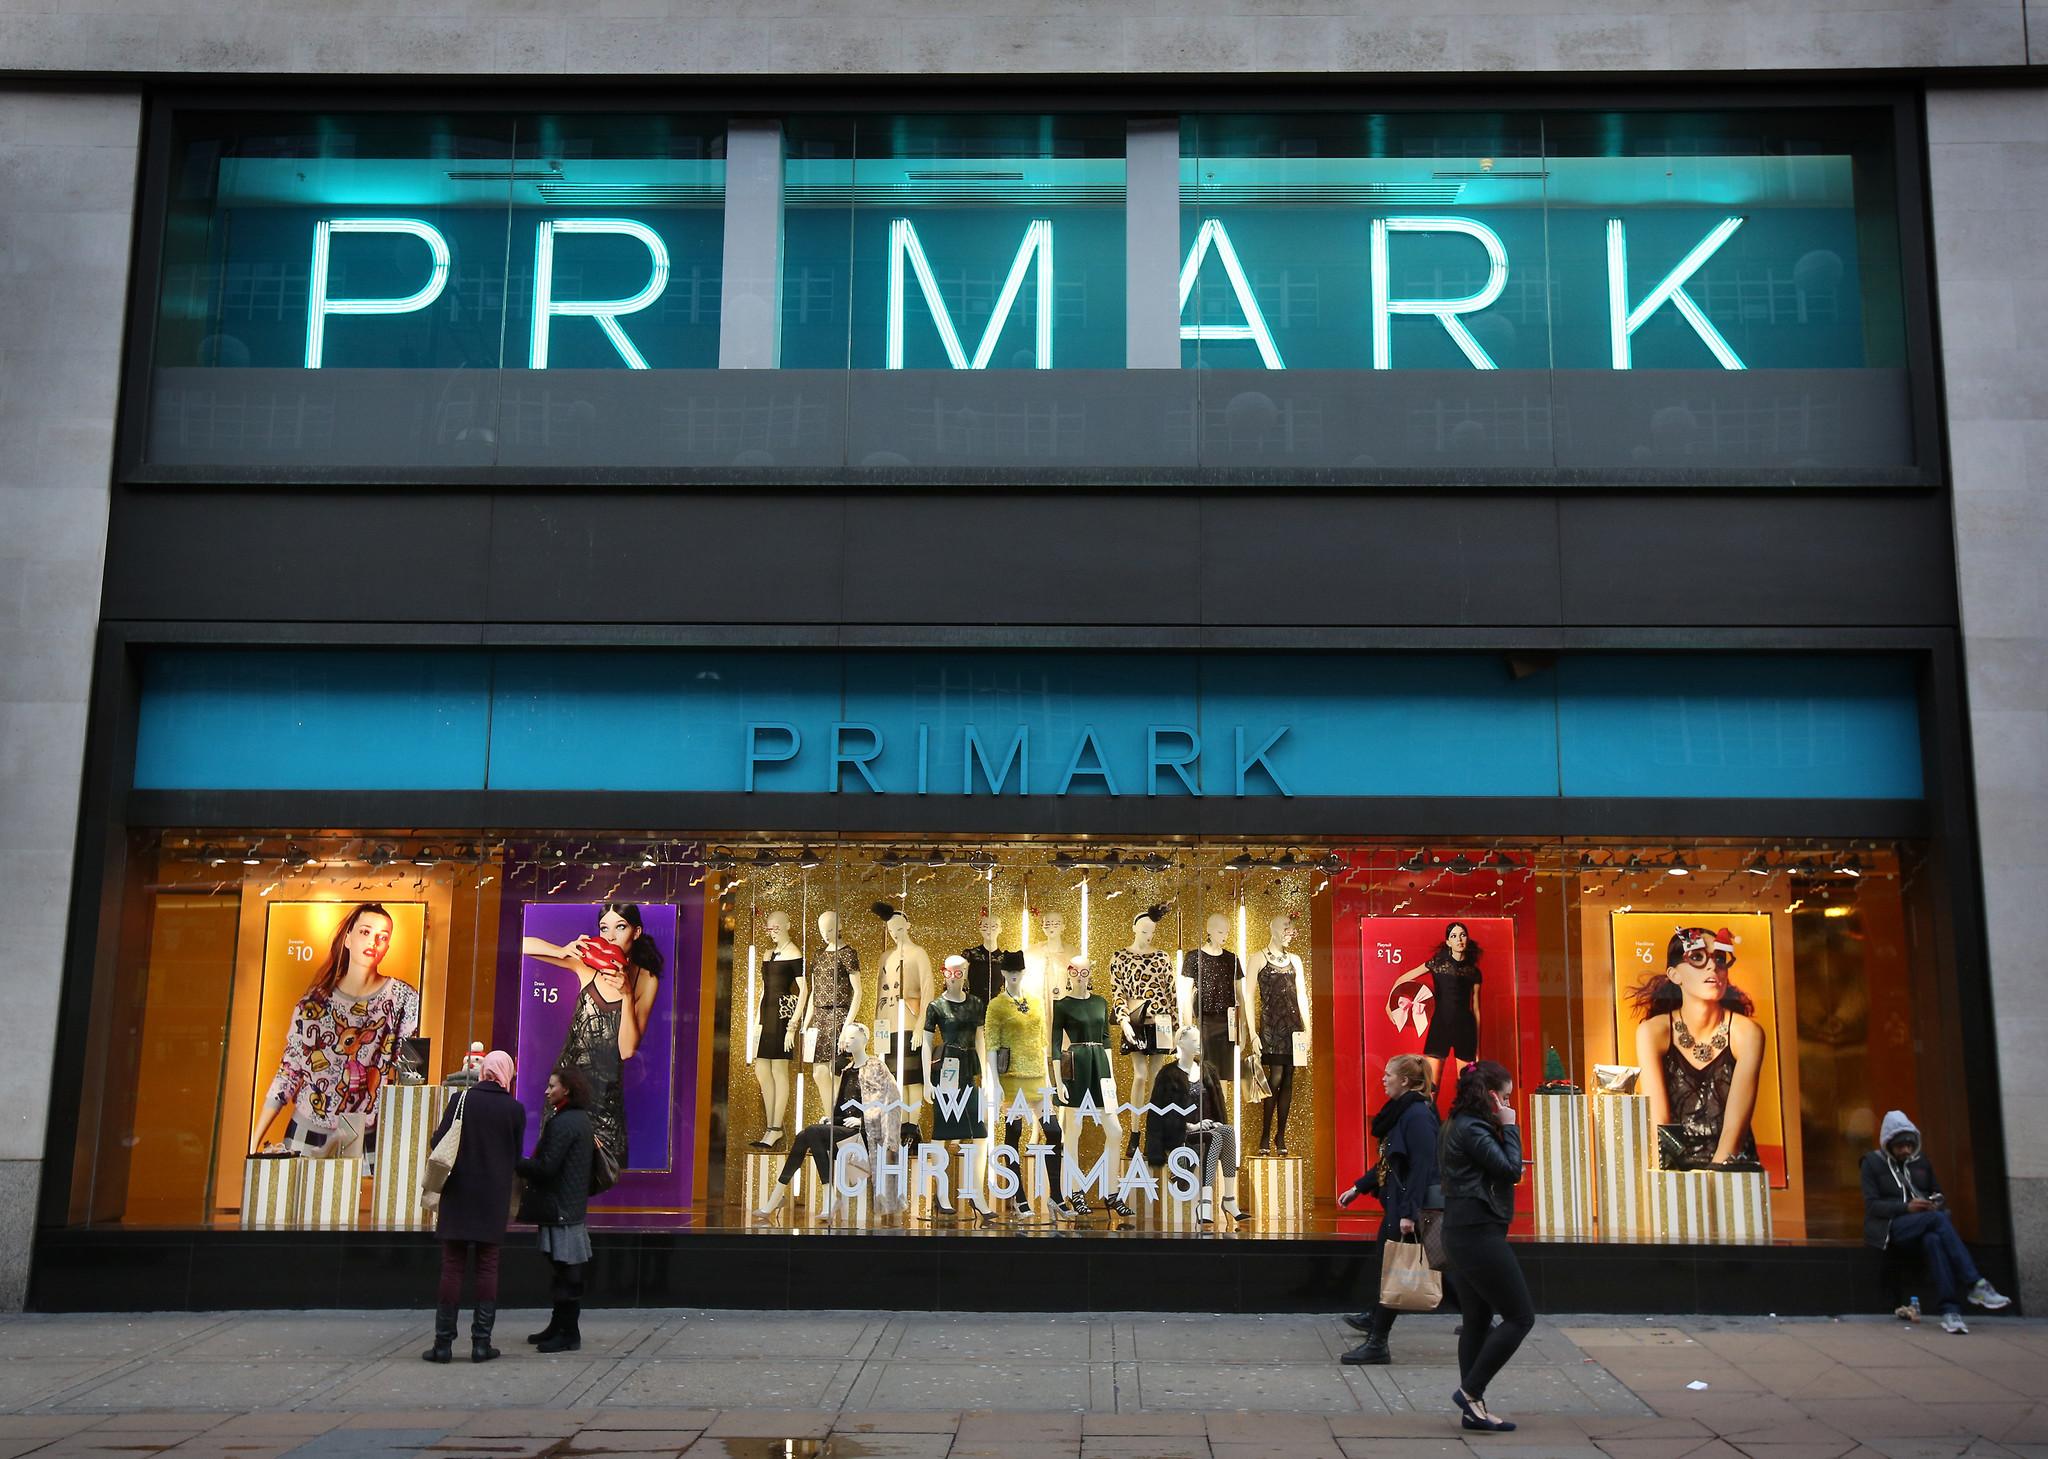 Customer finds human bone in Primark sock